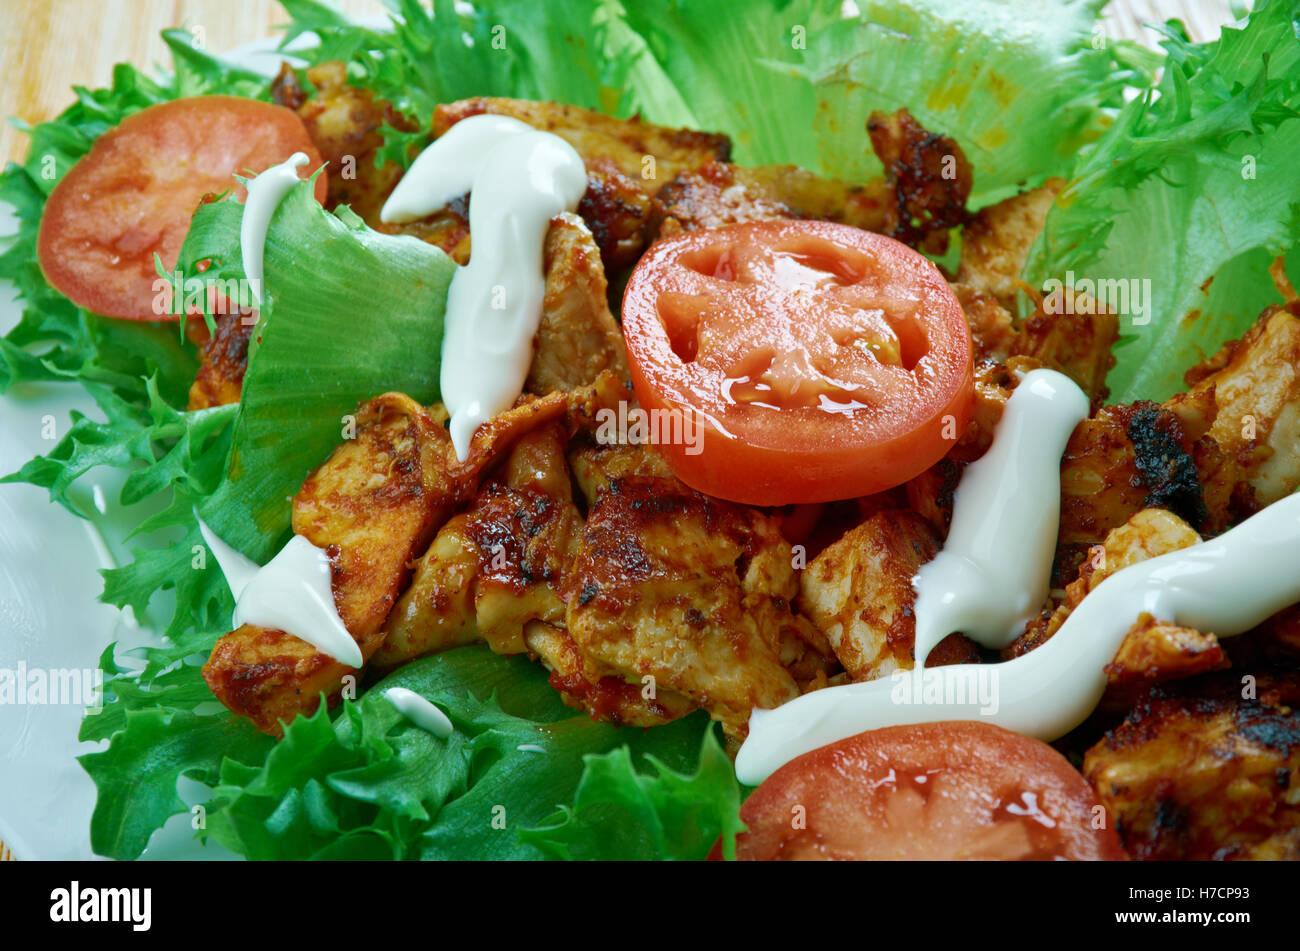 Jamaican Jerk Chicken Lettuce Wraps Caribbean Food Stock Photo Alamy